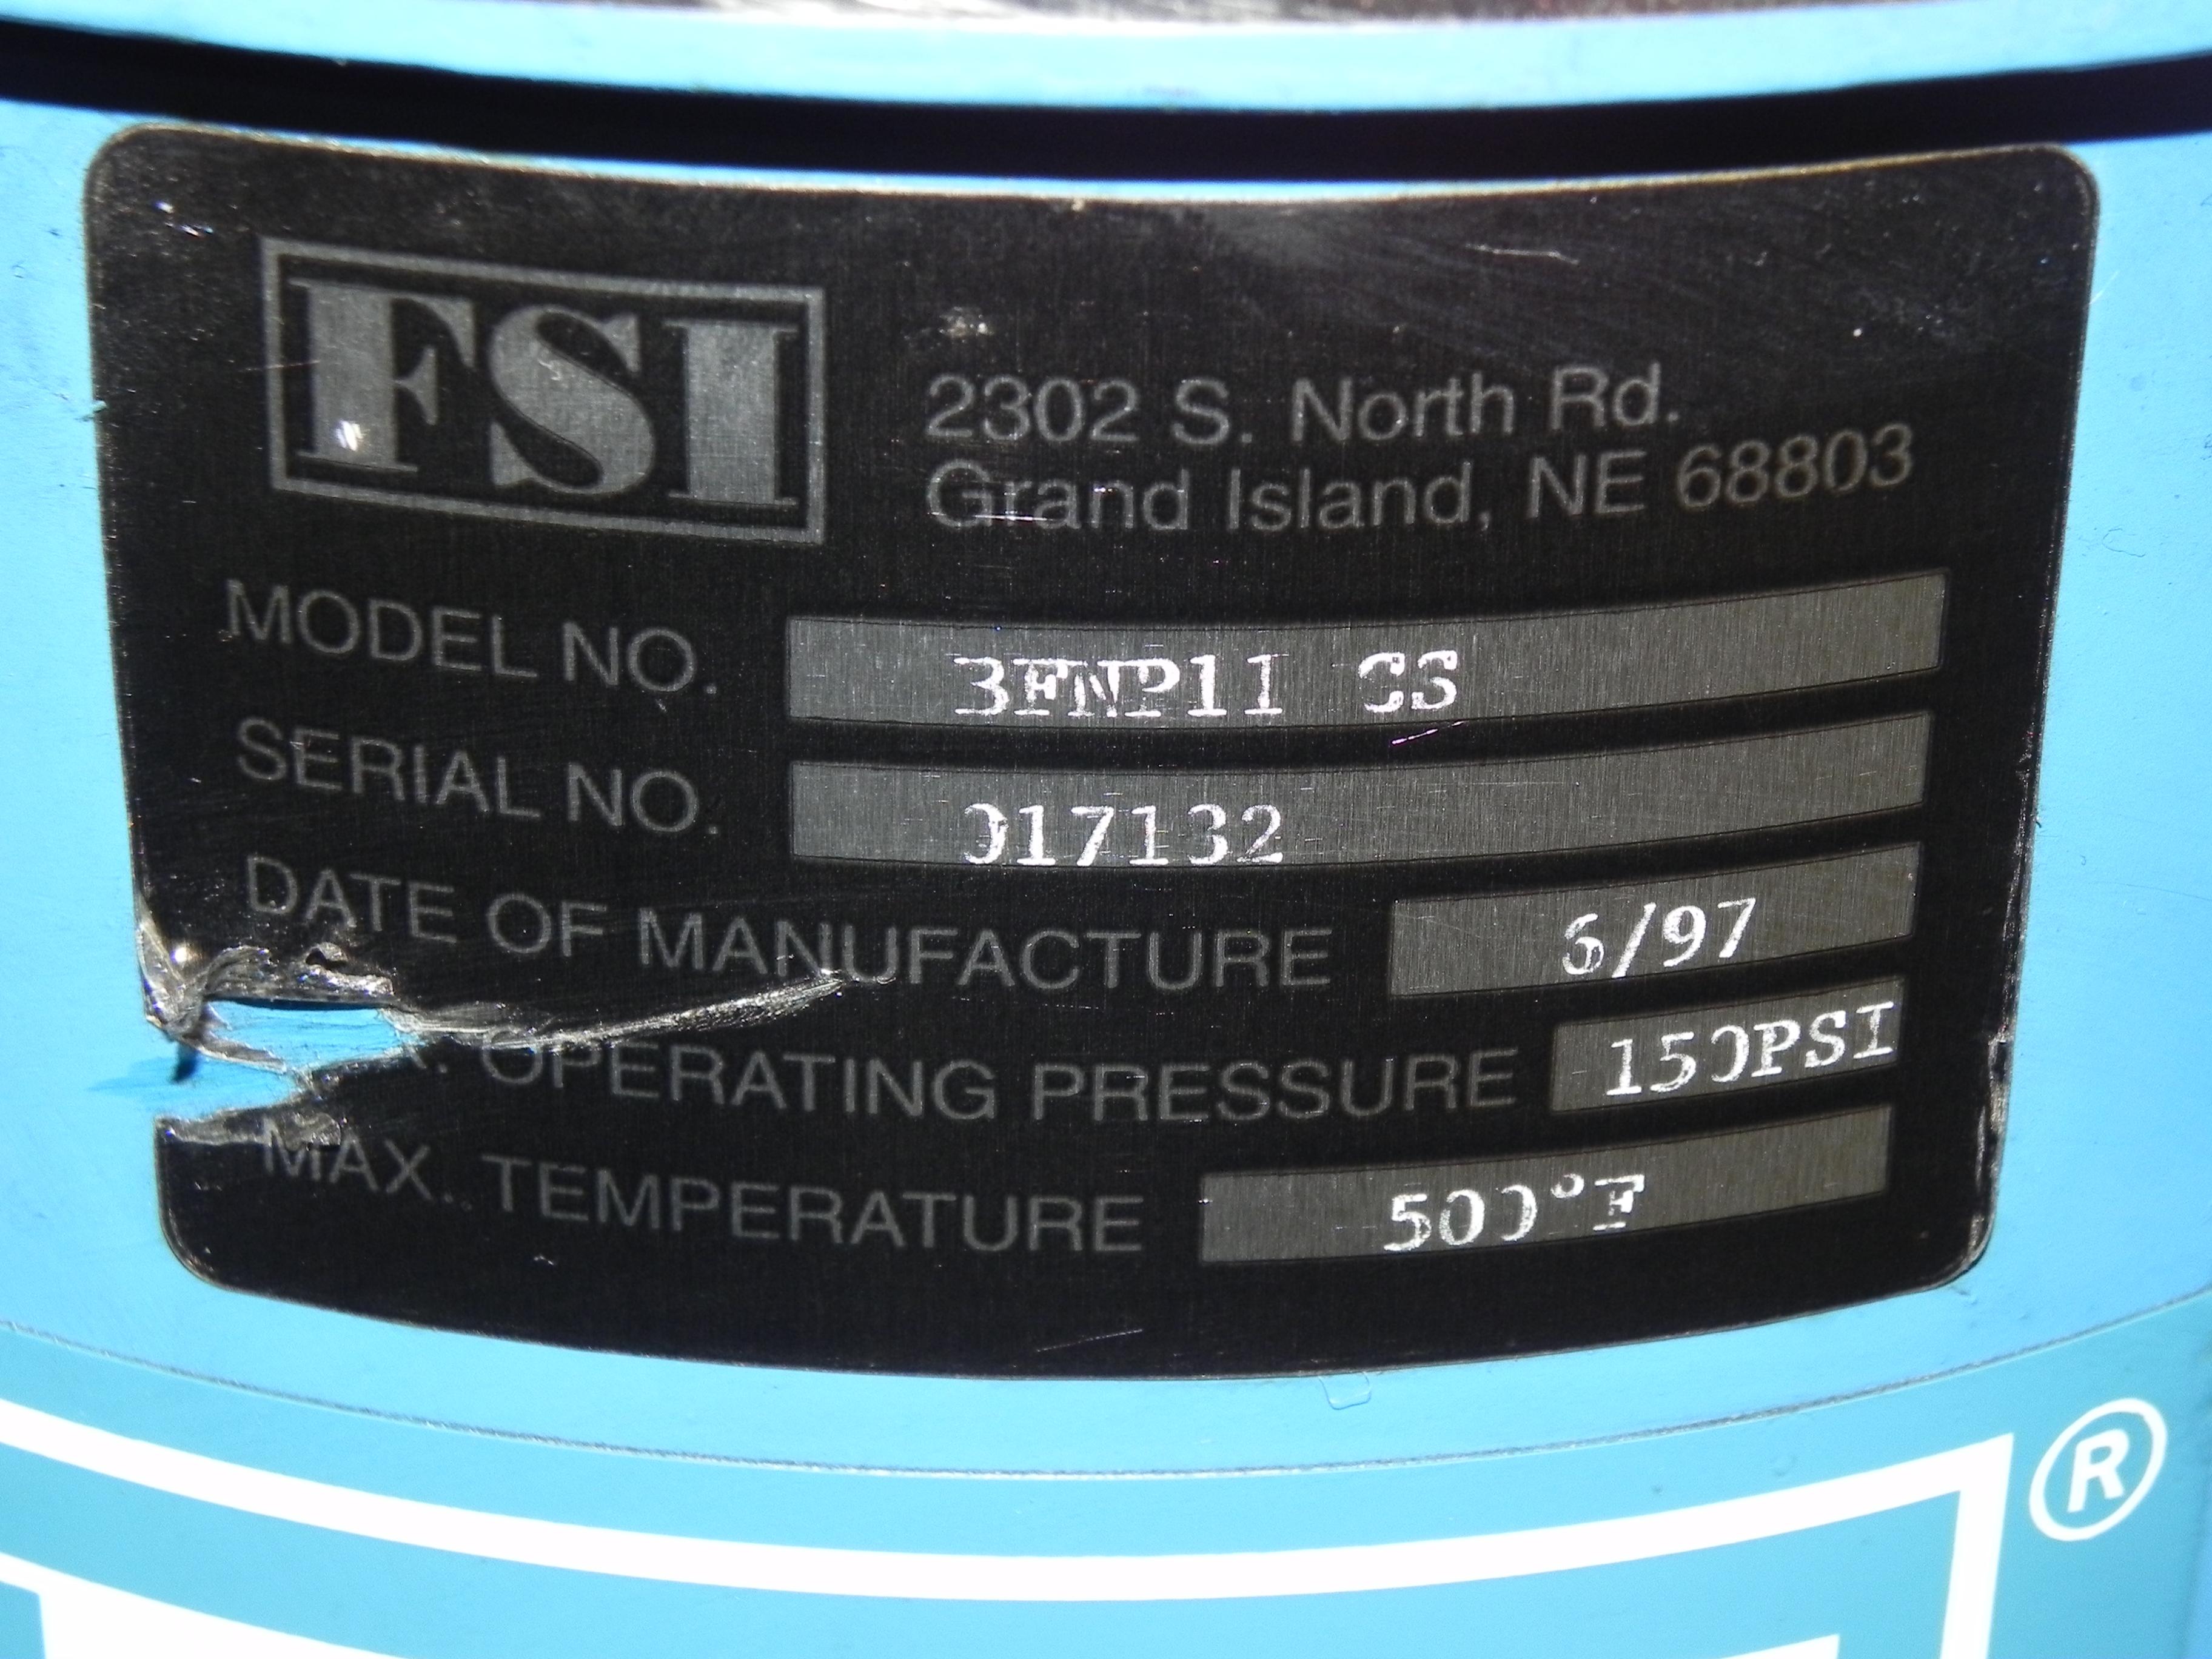 Lot 29 - FSI Bag Filter Vessel - BFNP11-CS